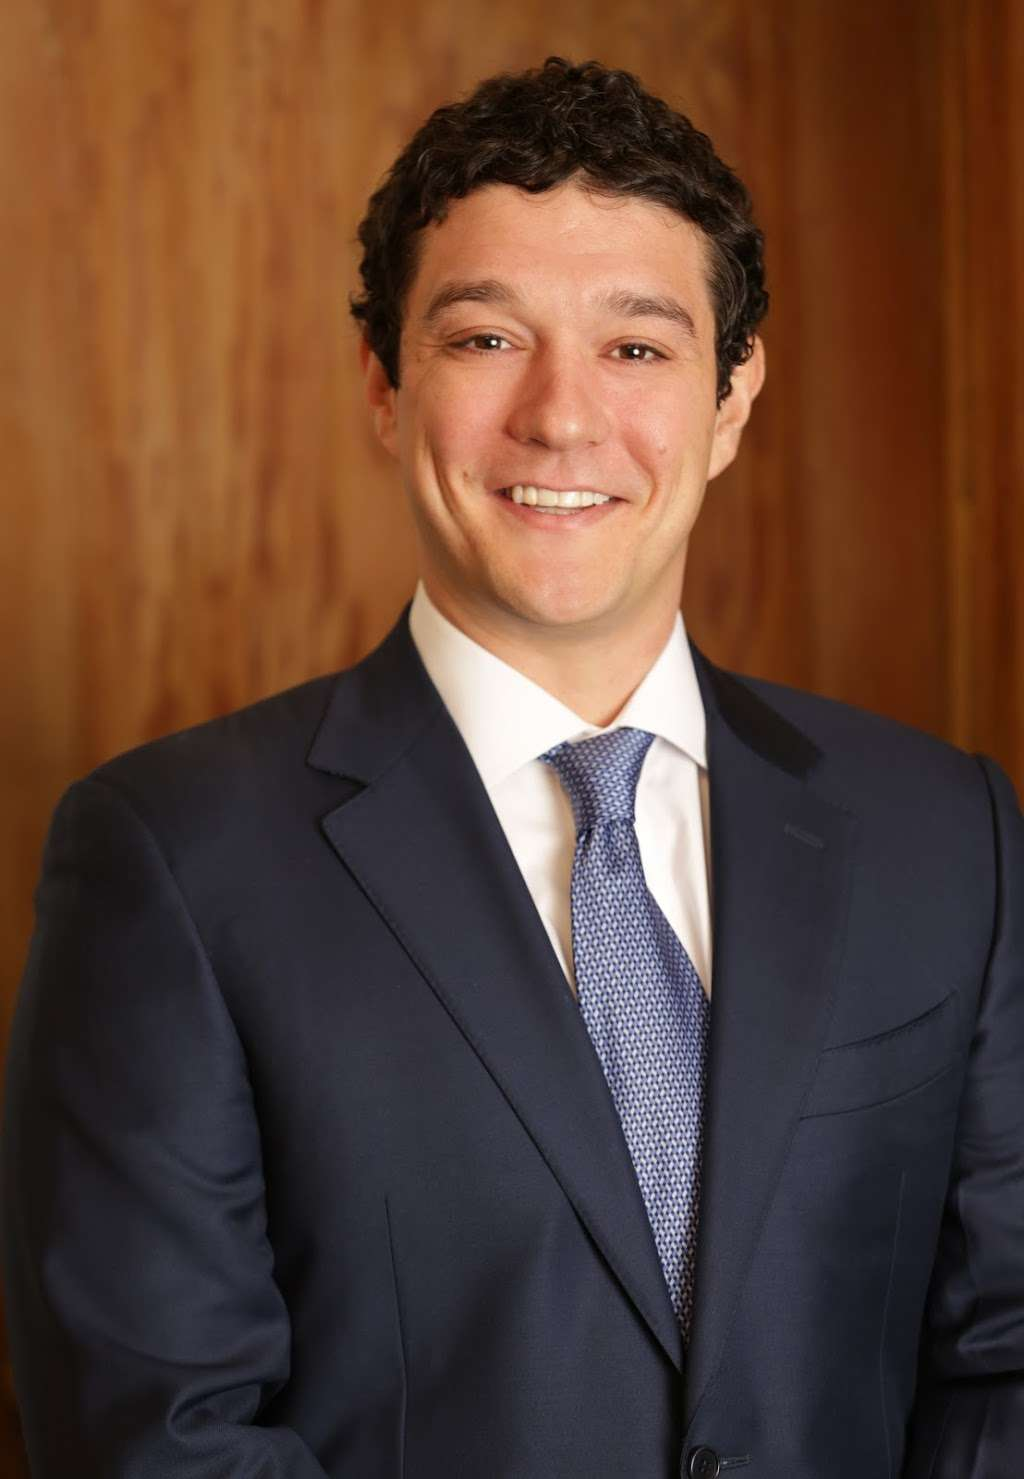 Jesse Minc Law Group - lawyer  | Photo 2 of 6 | Address: 930 Grand Concourse, 1 F, Bronx, NY 10451, USA | Phone: (718) 354-8000